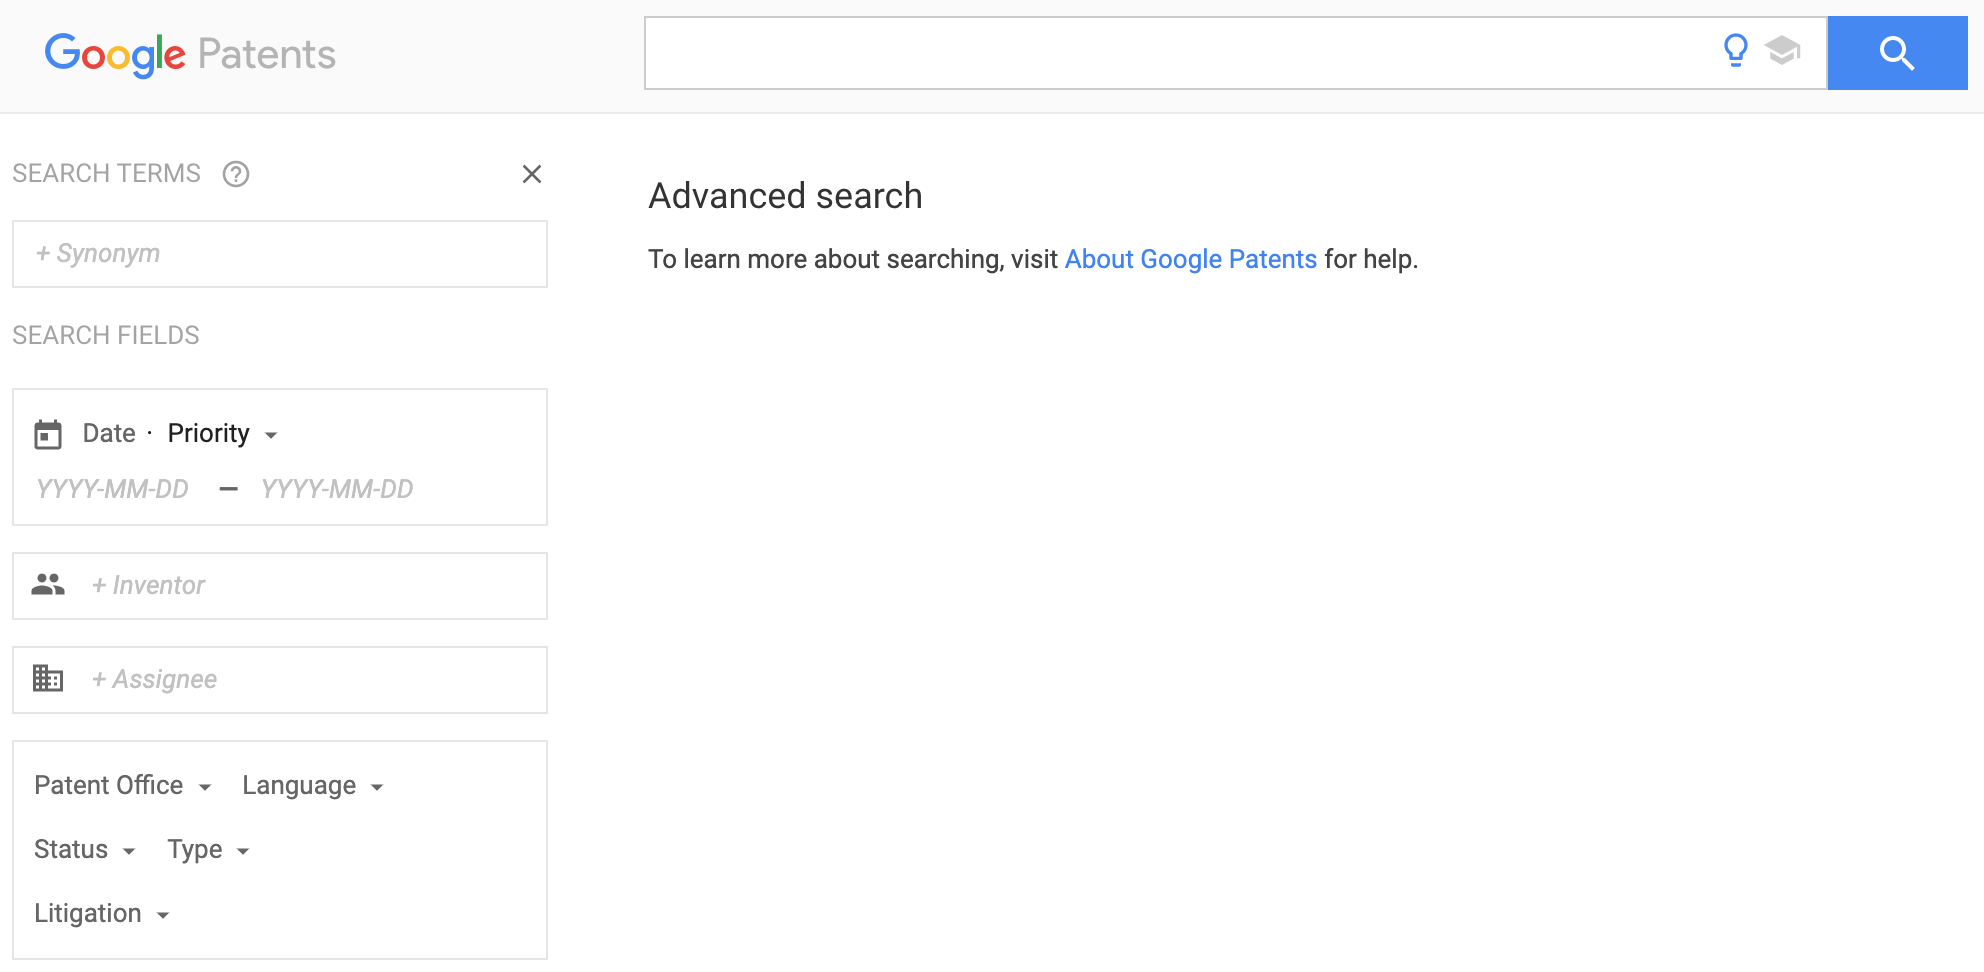 Google Patents advanced search interface